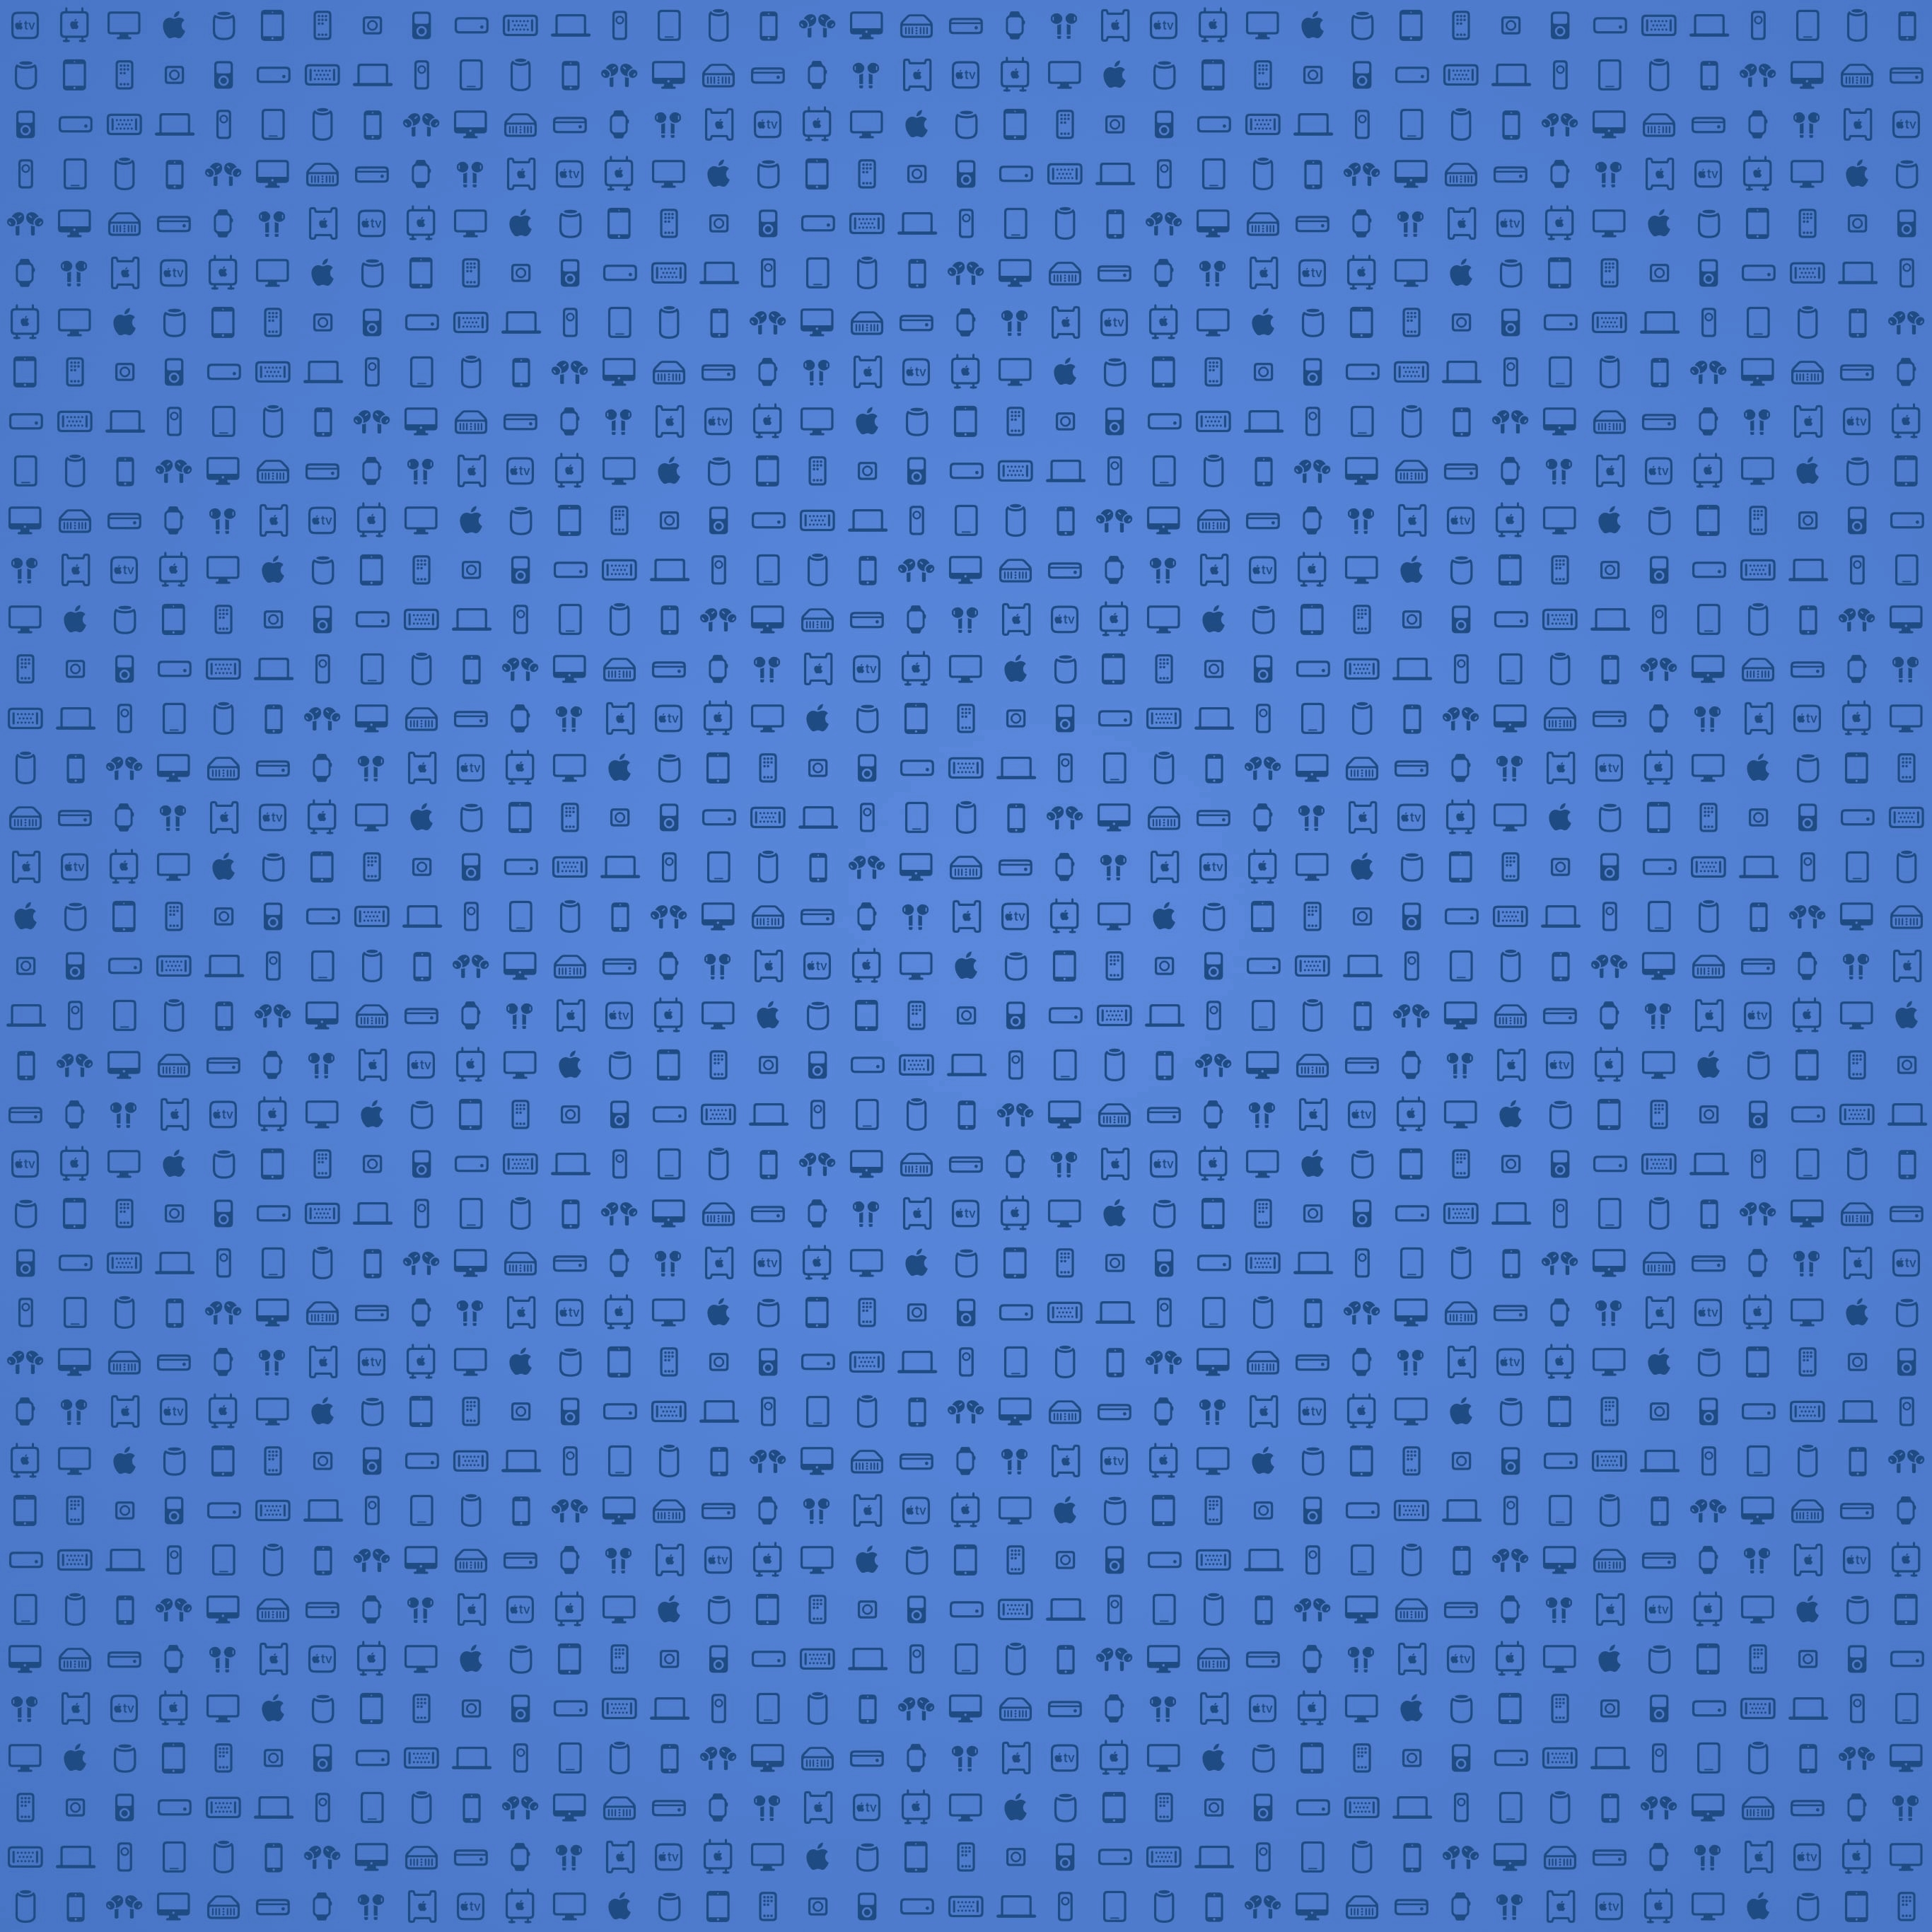 Spring Loaded Symbols basicappleguy idownloadblog Capri Blue Silicon iPad Pro